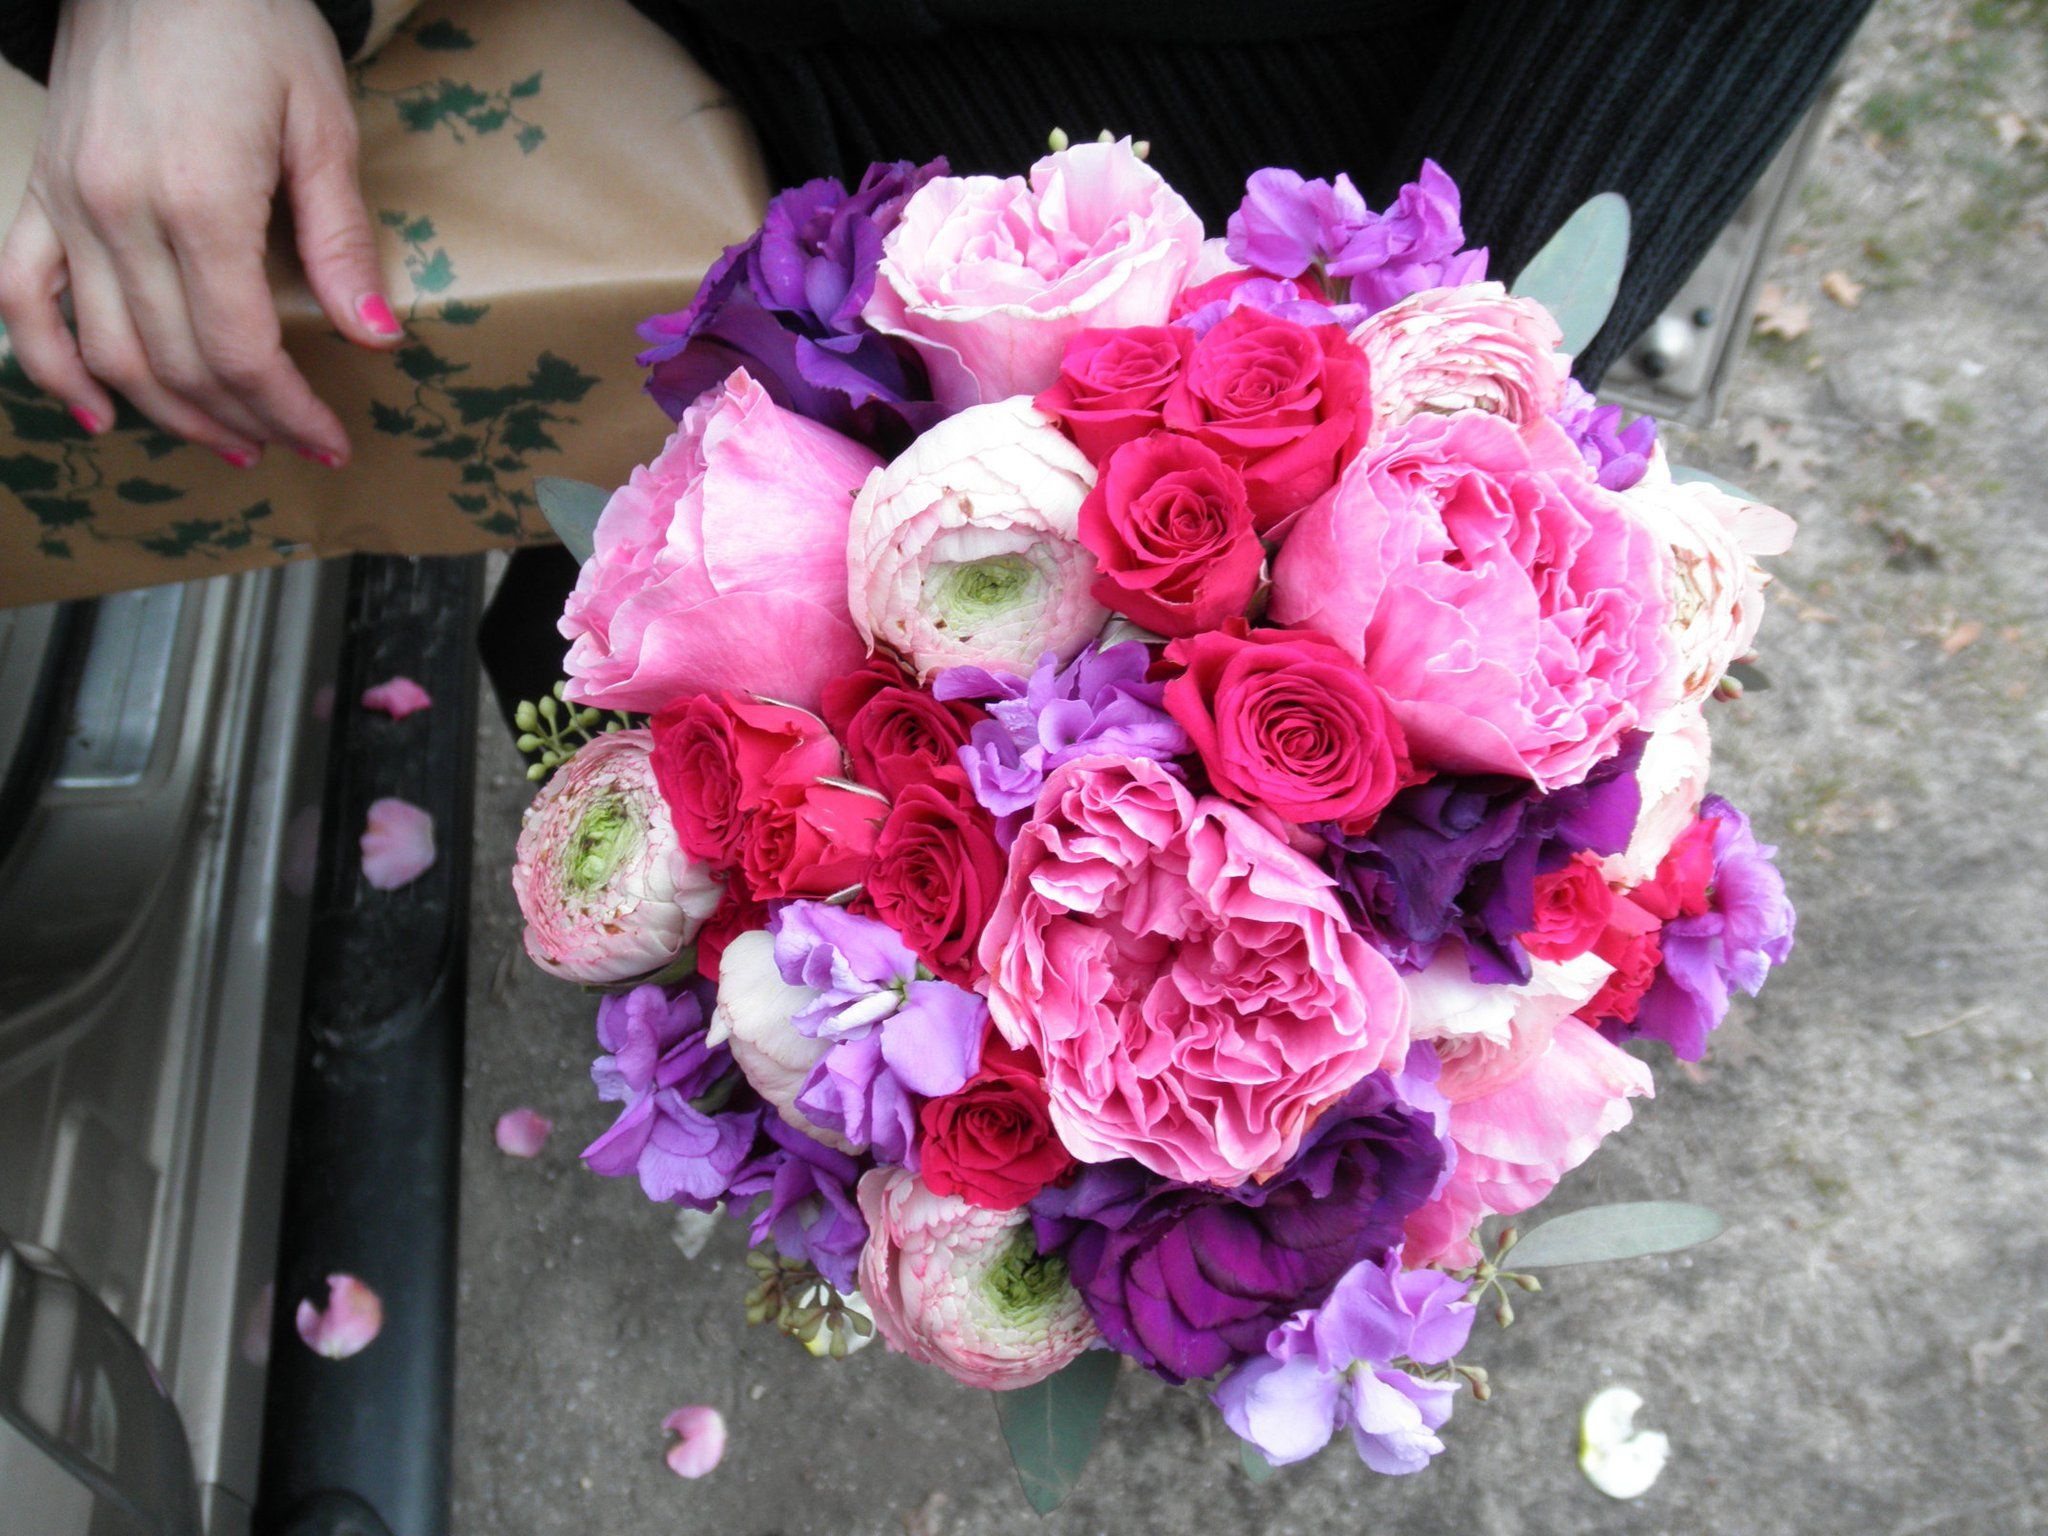 hot pink spray roses, pink garden roses, pink ranunculus, purple ...